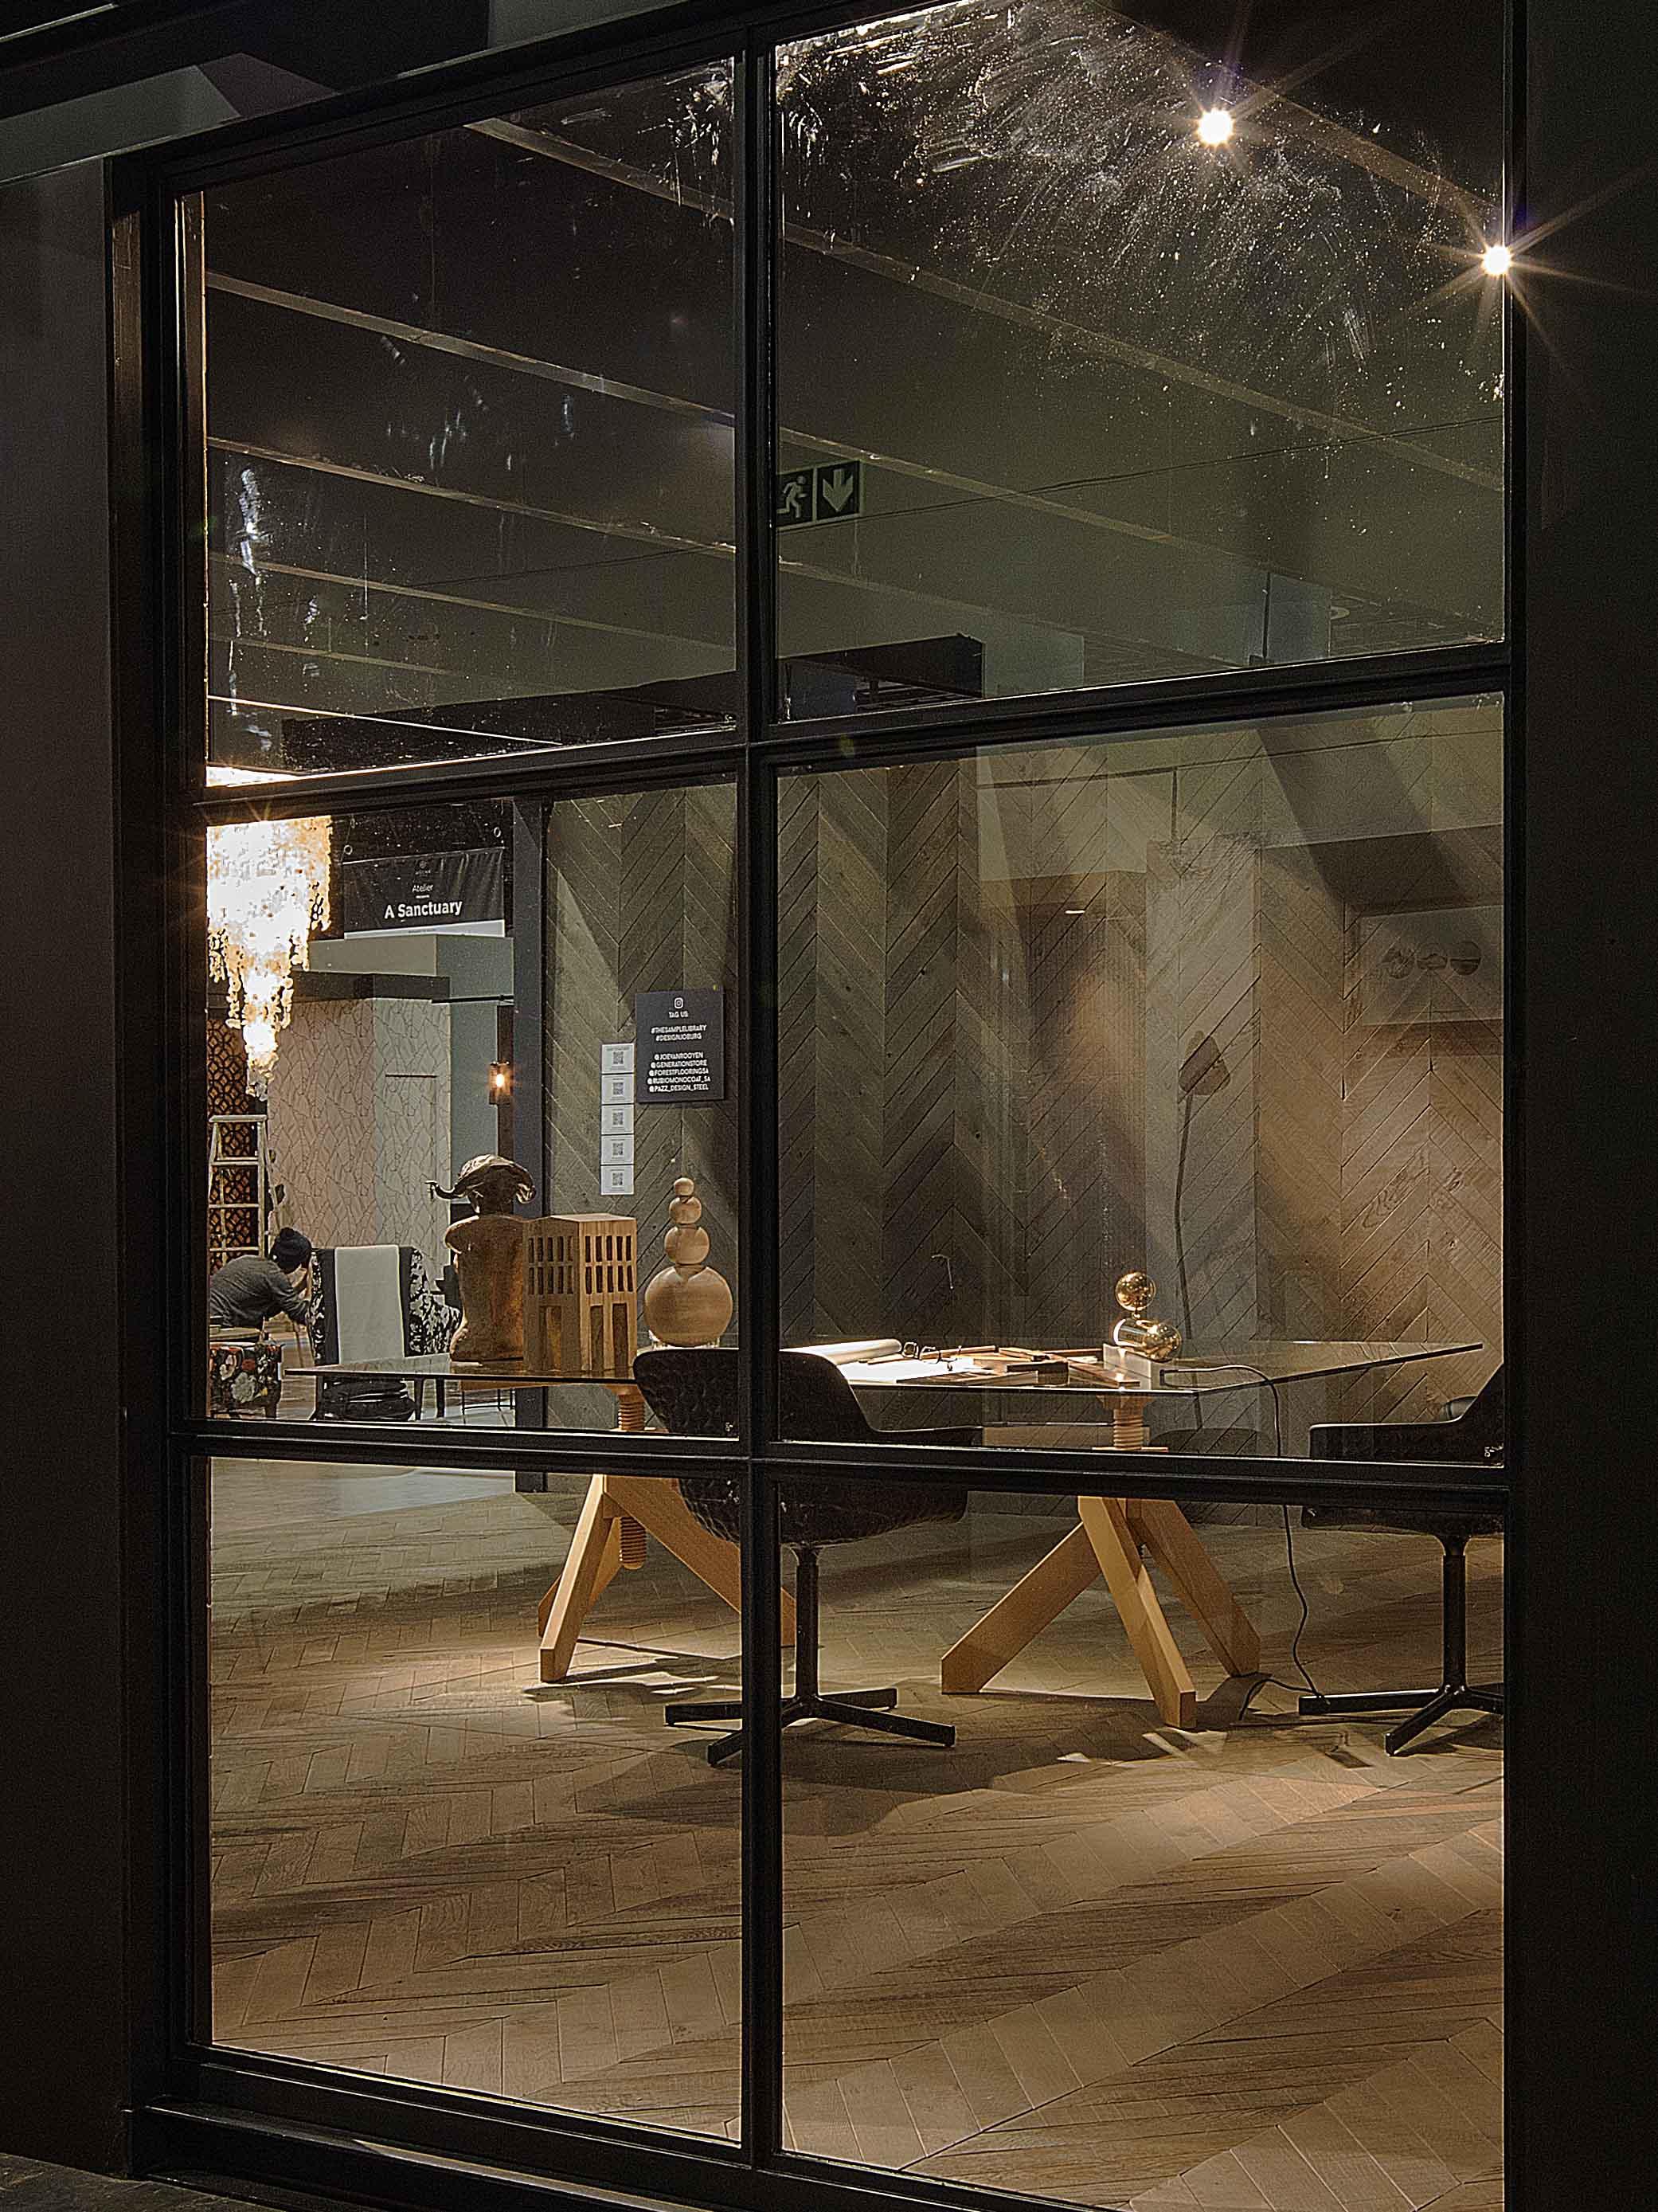 JVR Architects Rooms on View 14 05 2017_3952 v1.jpg